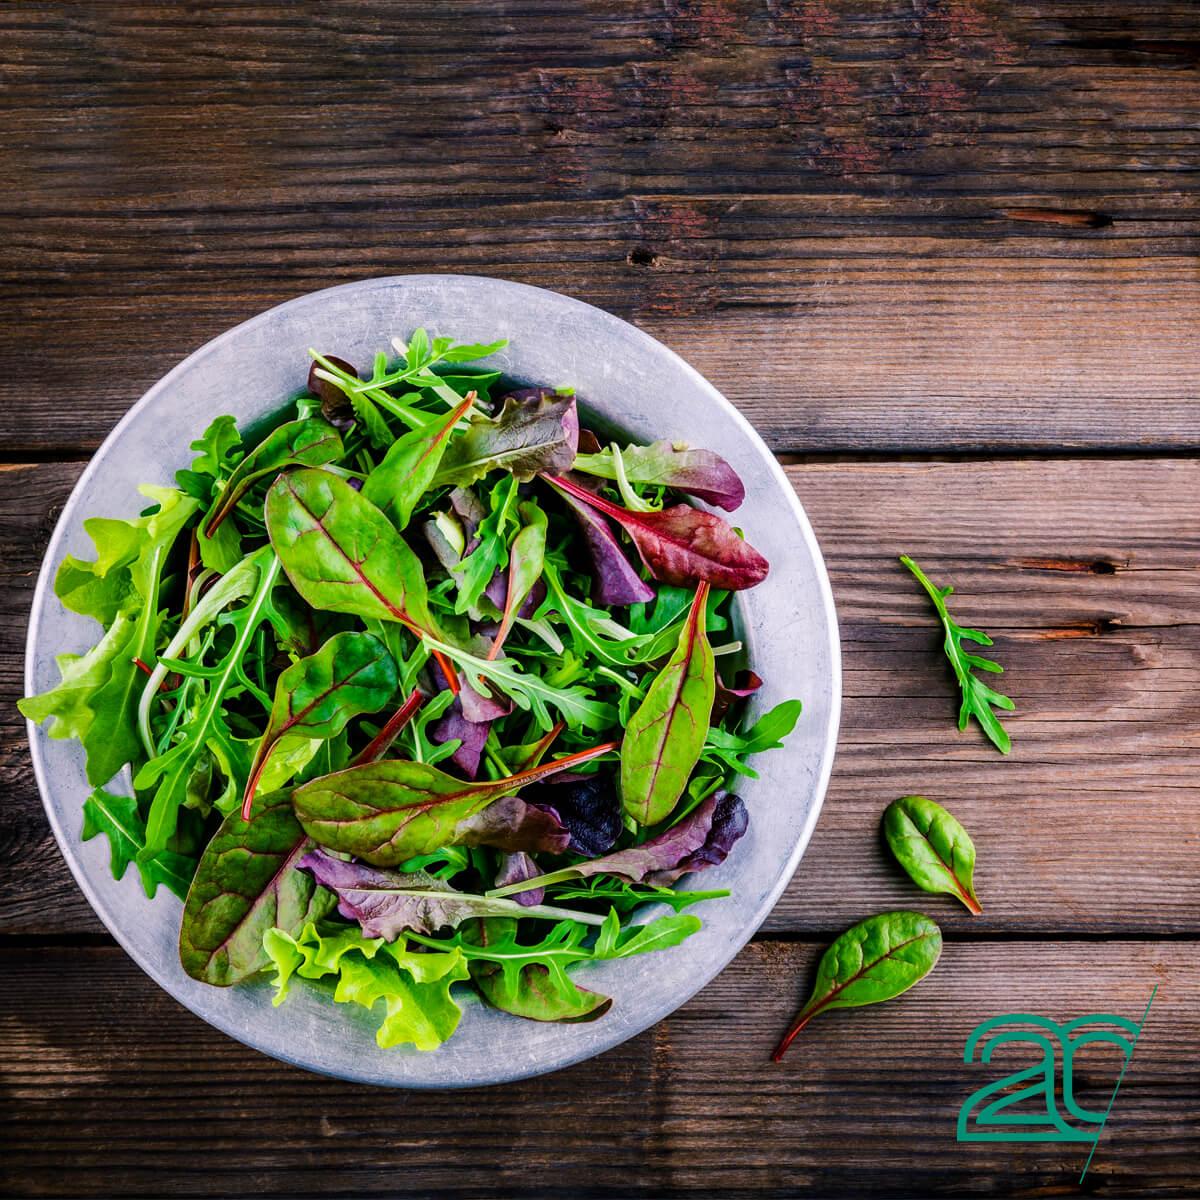 A Salad Bowl, Part of 20PerFit's Anti-Inflammatory Diet